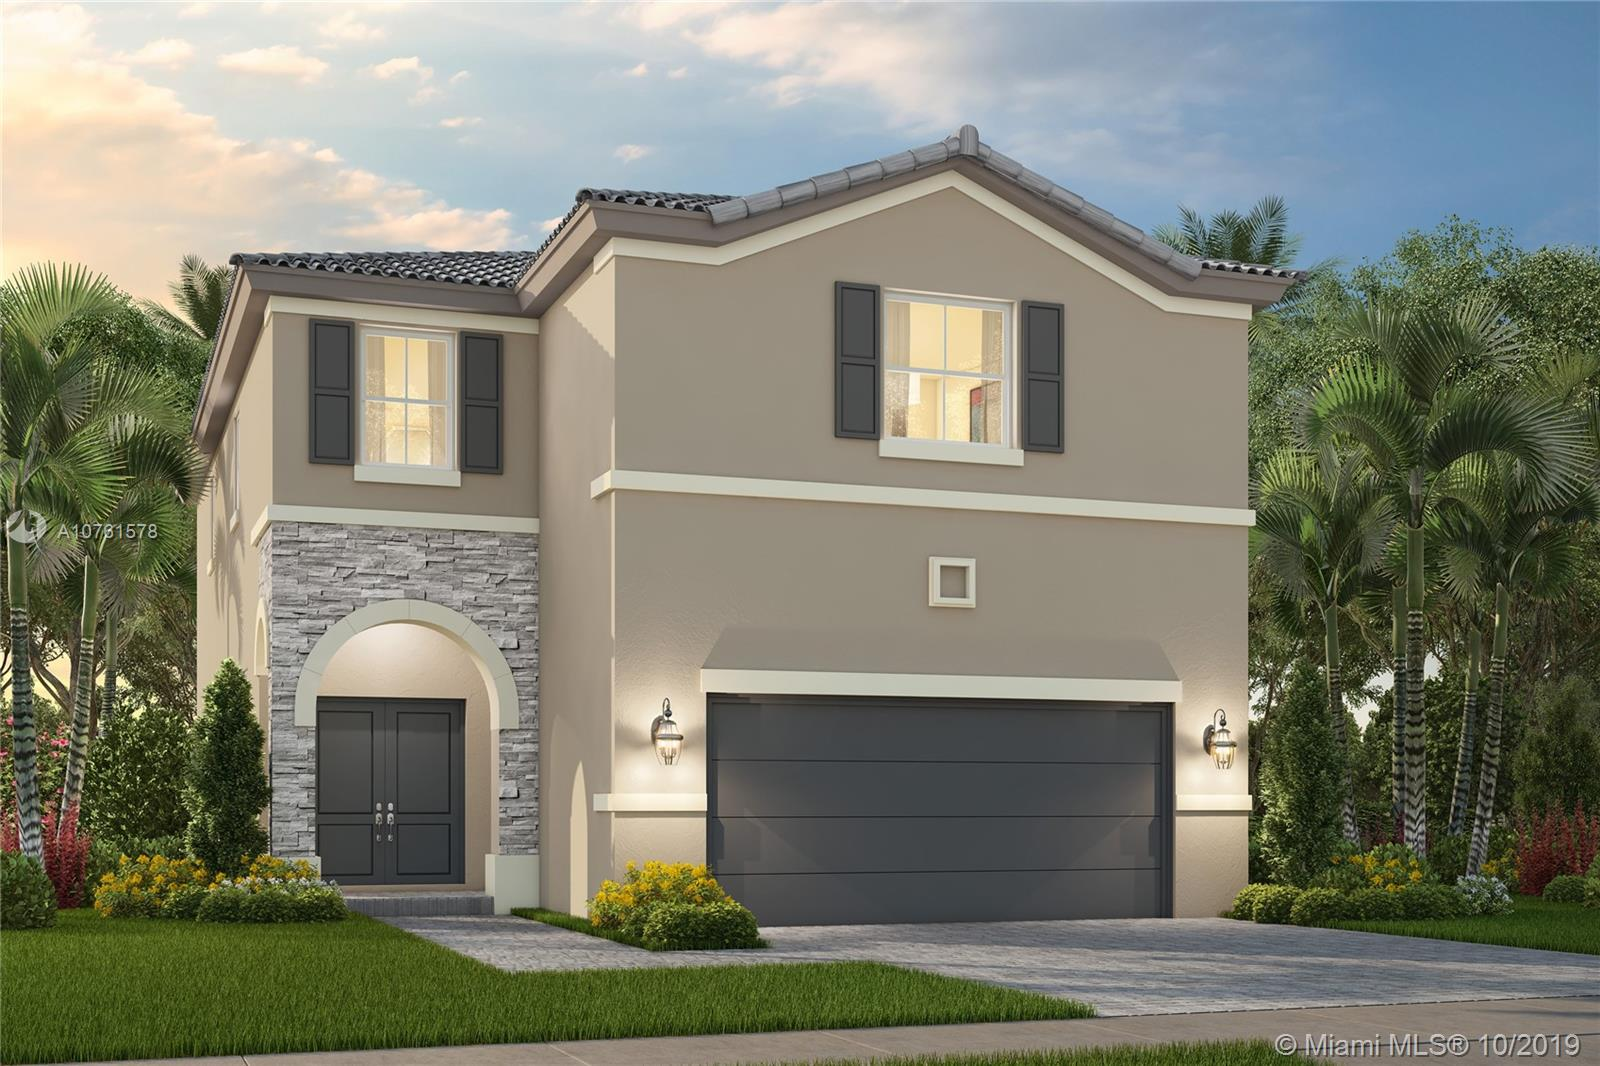 1422 SE 26 TERR, Homestead, FL 33033 - Homestead, FL real estate listing